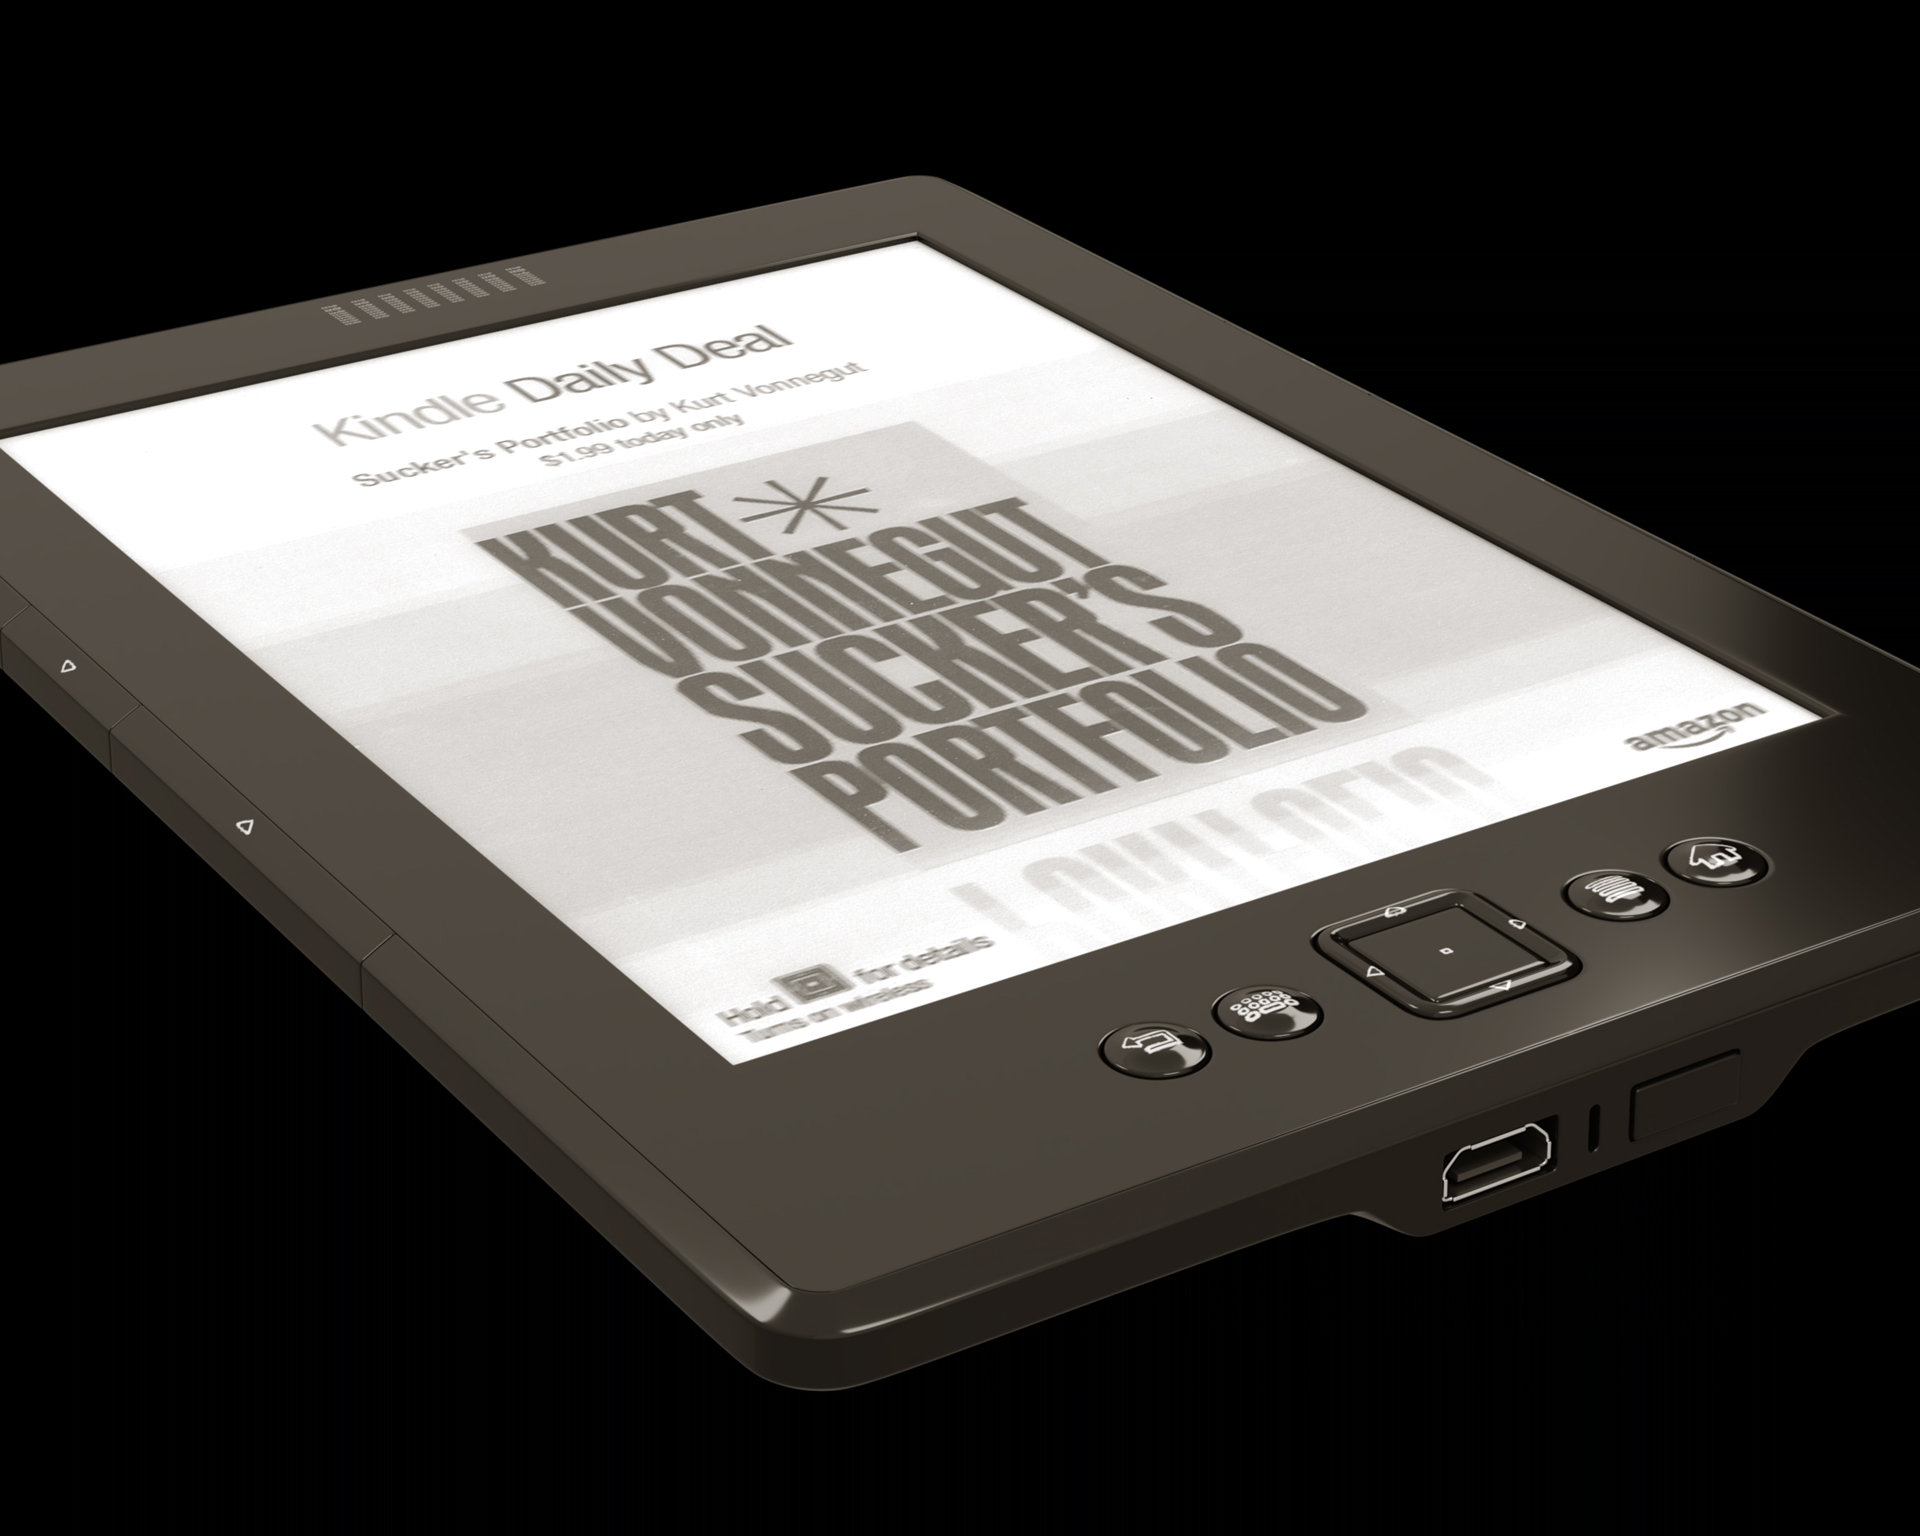 e-reader-kindel-amazon-alfonso-perez-alvarez